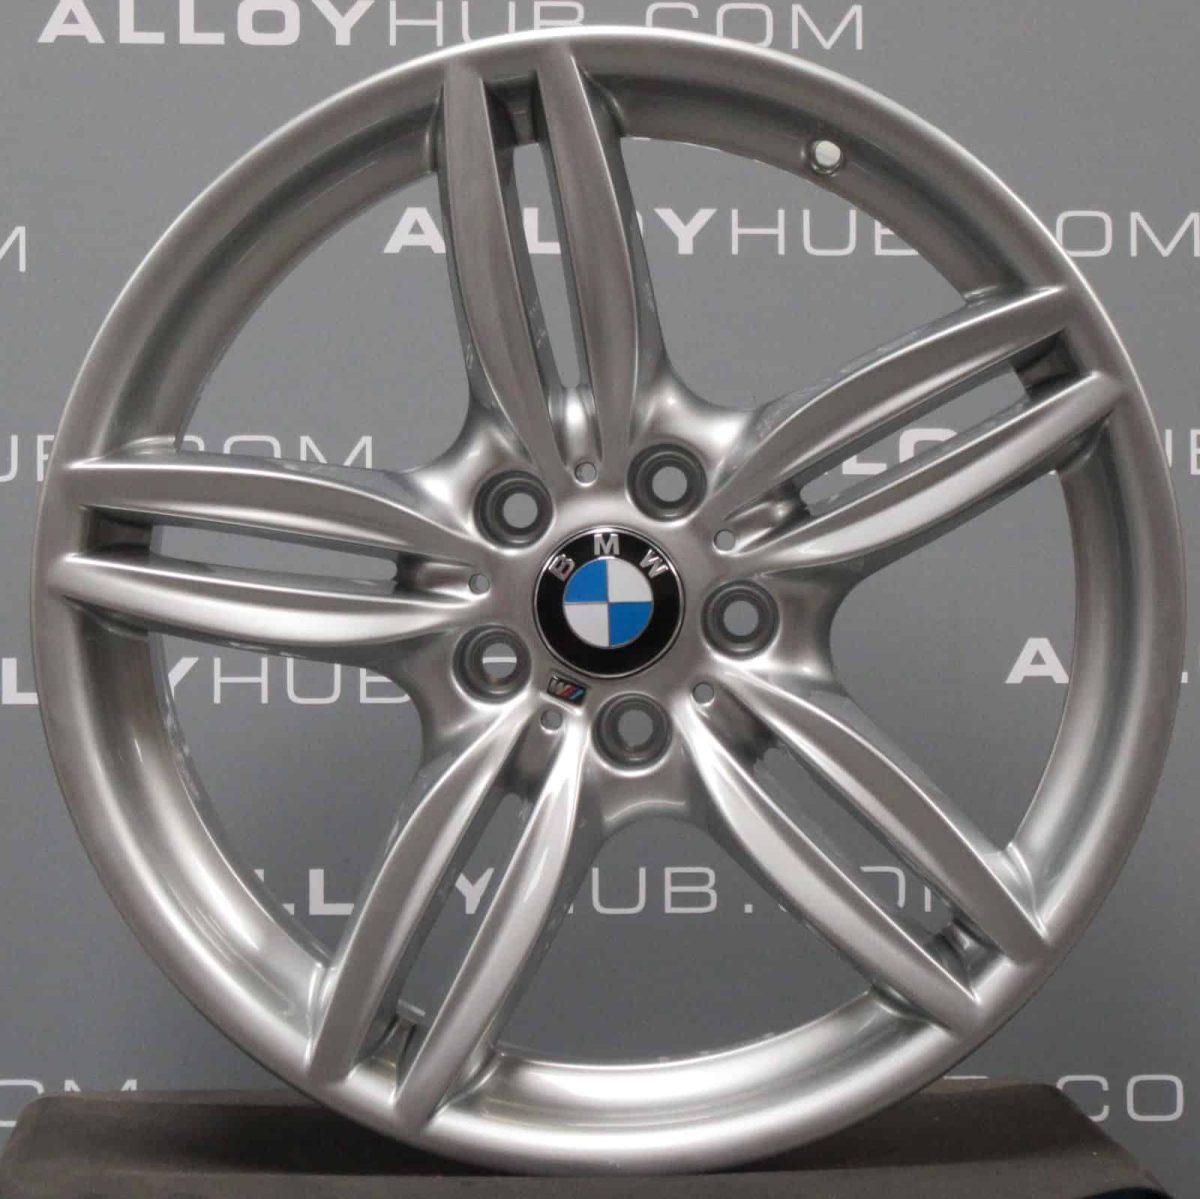 Genuine BMW 5/6 Series F10 F11 F12 F13 F06 Style 351M Sport 19″ inch 5 Twin Spoke Alloy Wheels with Silver Finish 36117842652 36117842653